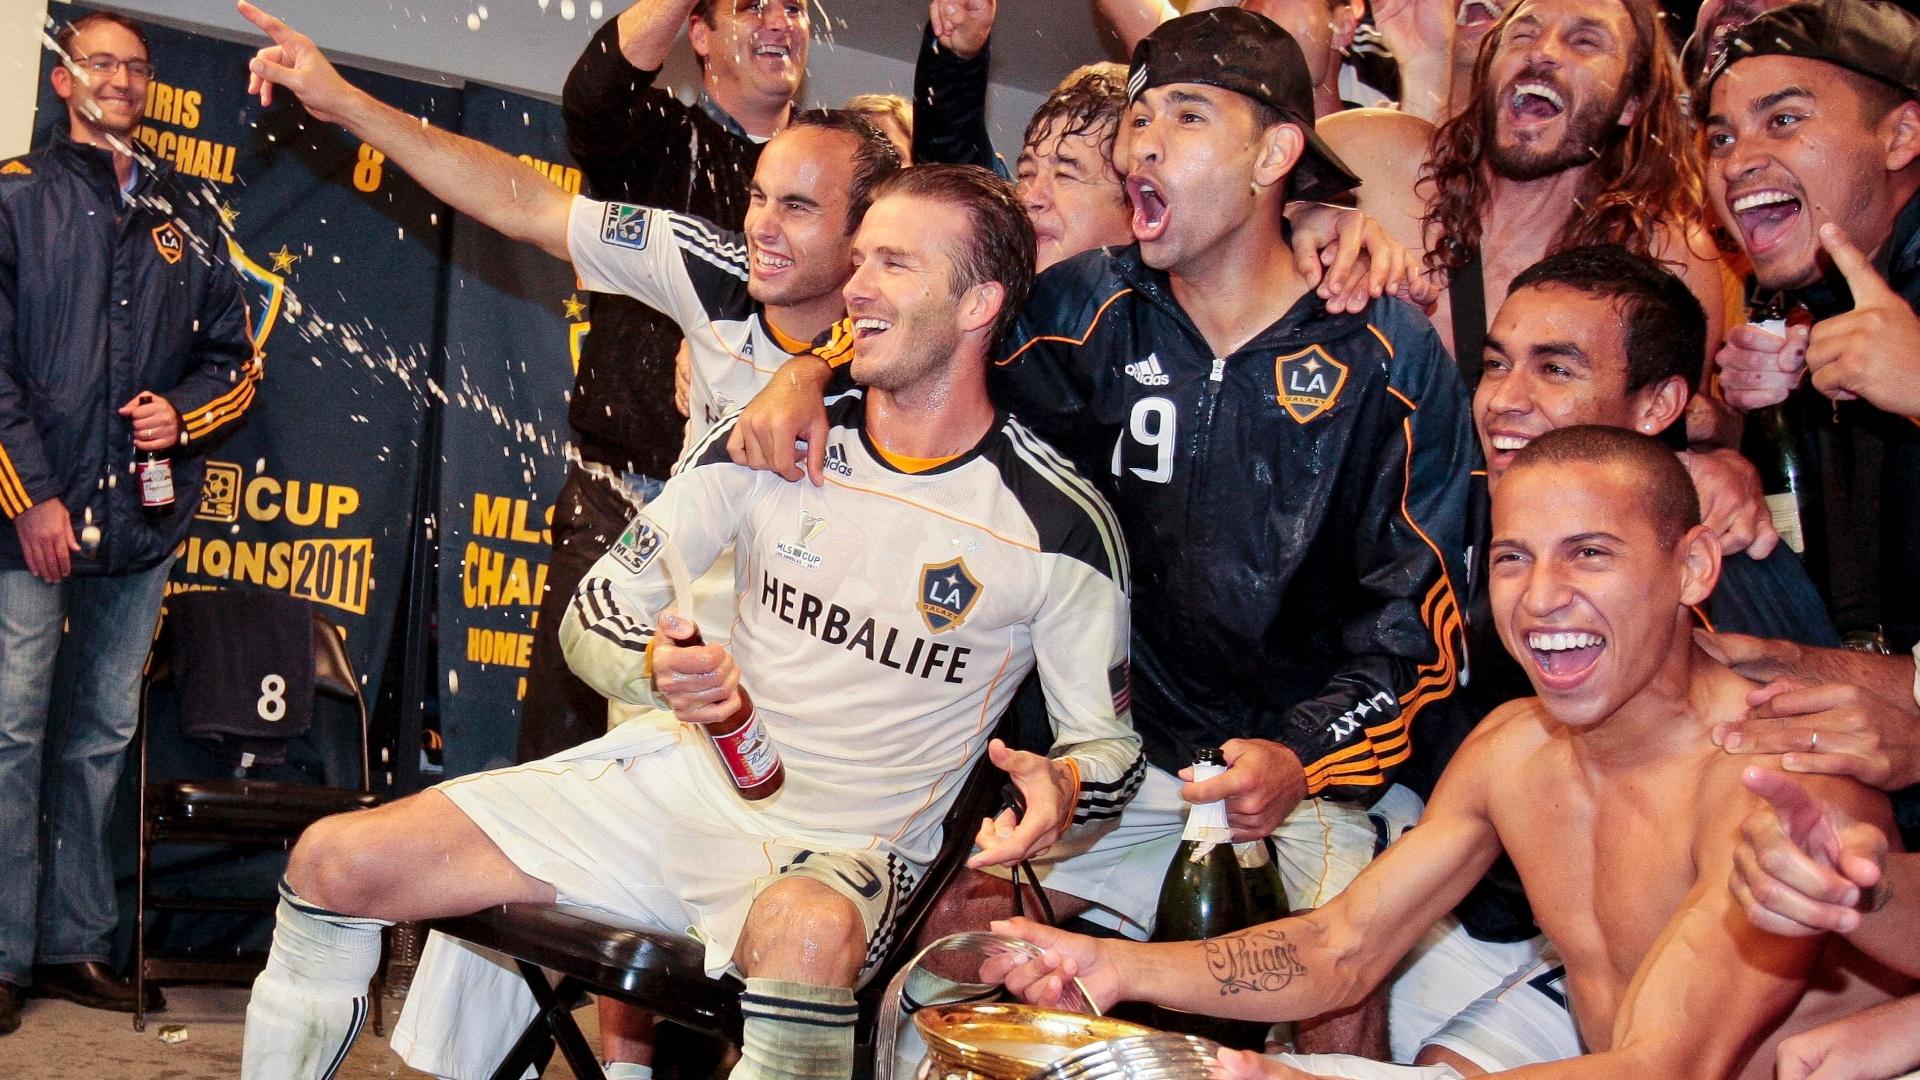 David Beckham comemora ao lado de Landon Donovan e os companheiros de Los Angeles Galaxy na conquista da MLS (20/11/2011)